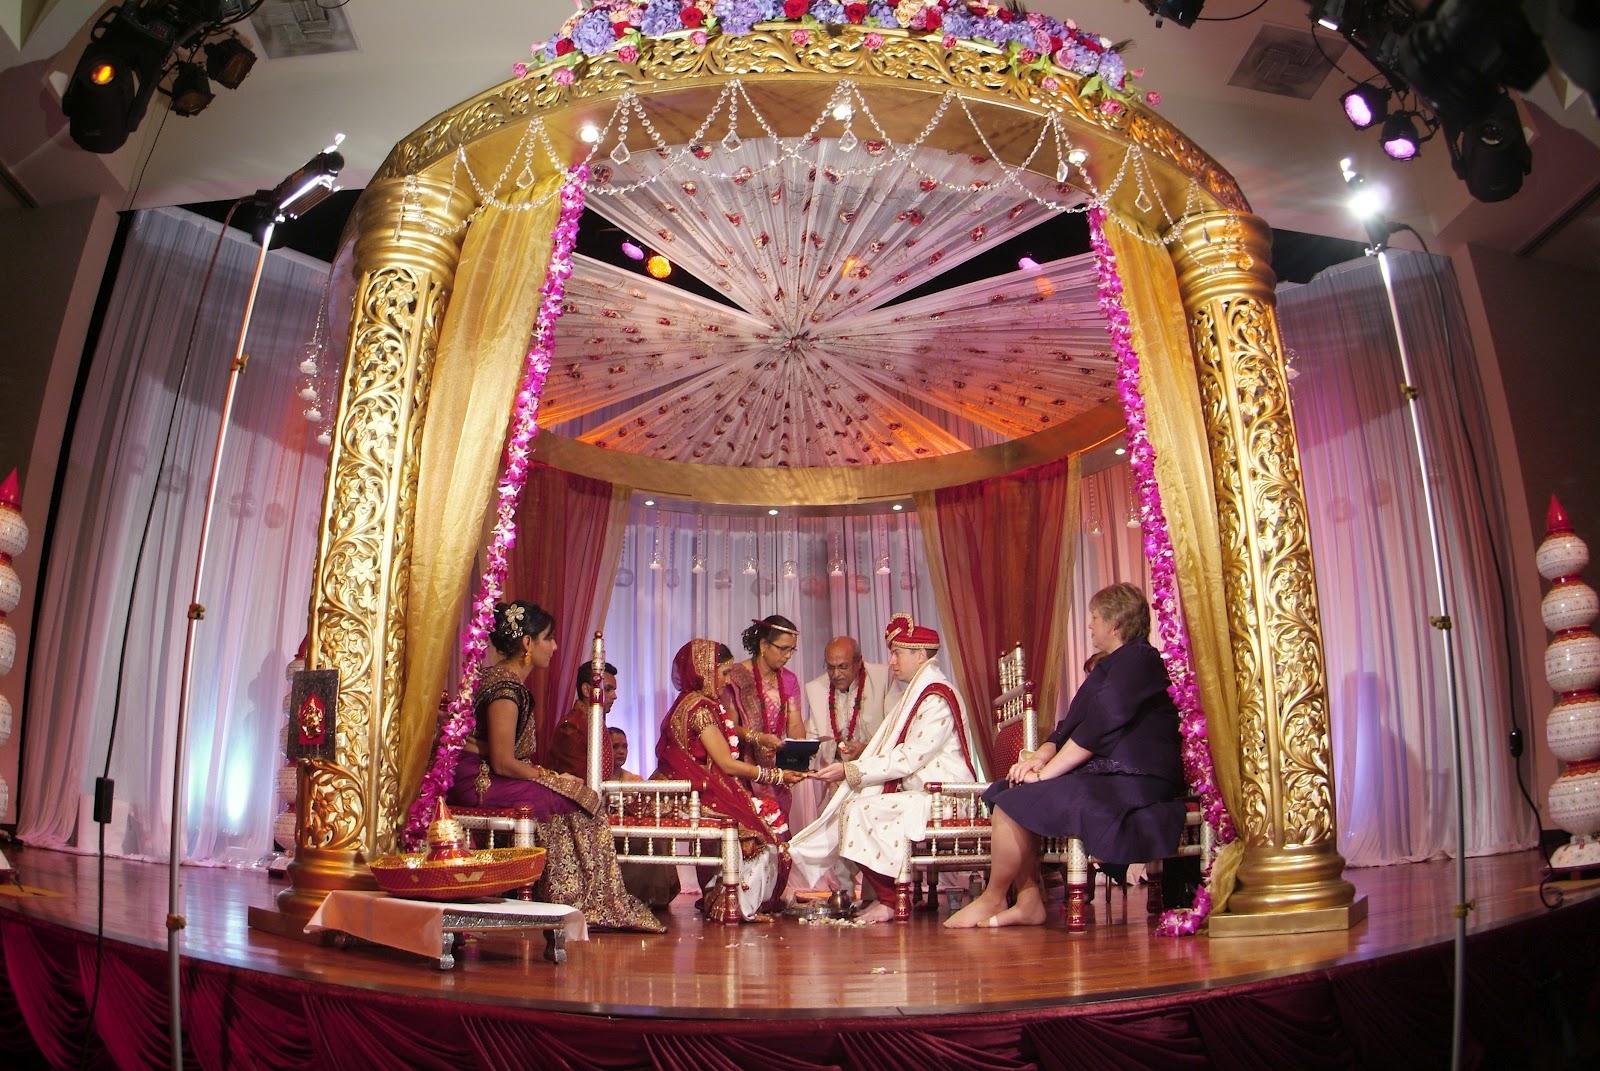 Sonal J Shah Event Consultants Llc Who Belongs At The Mandap